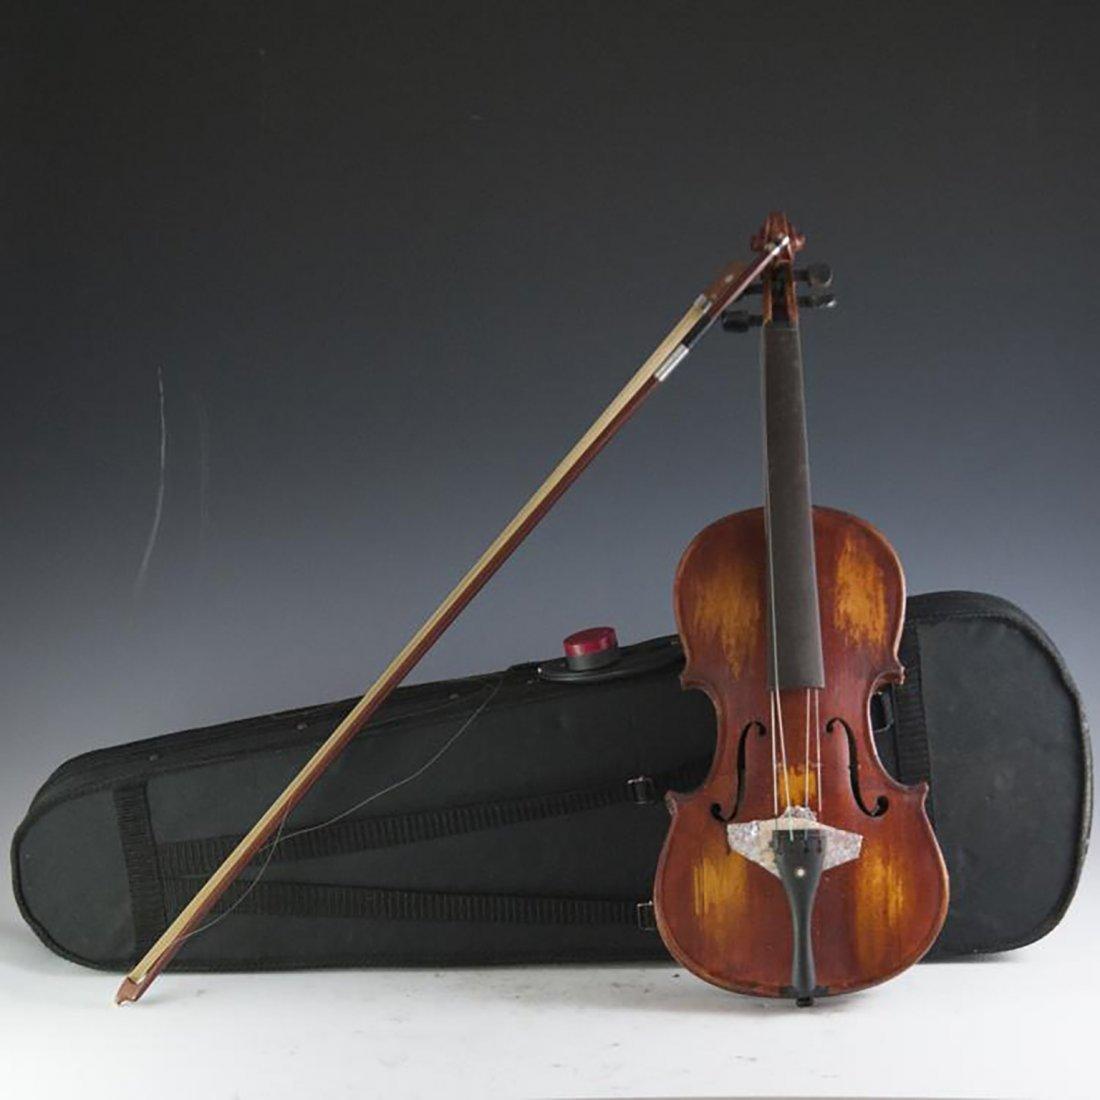 Continental Copy of a Stradivarius Violin